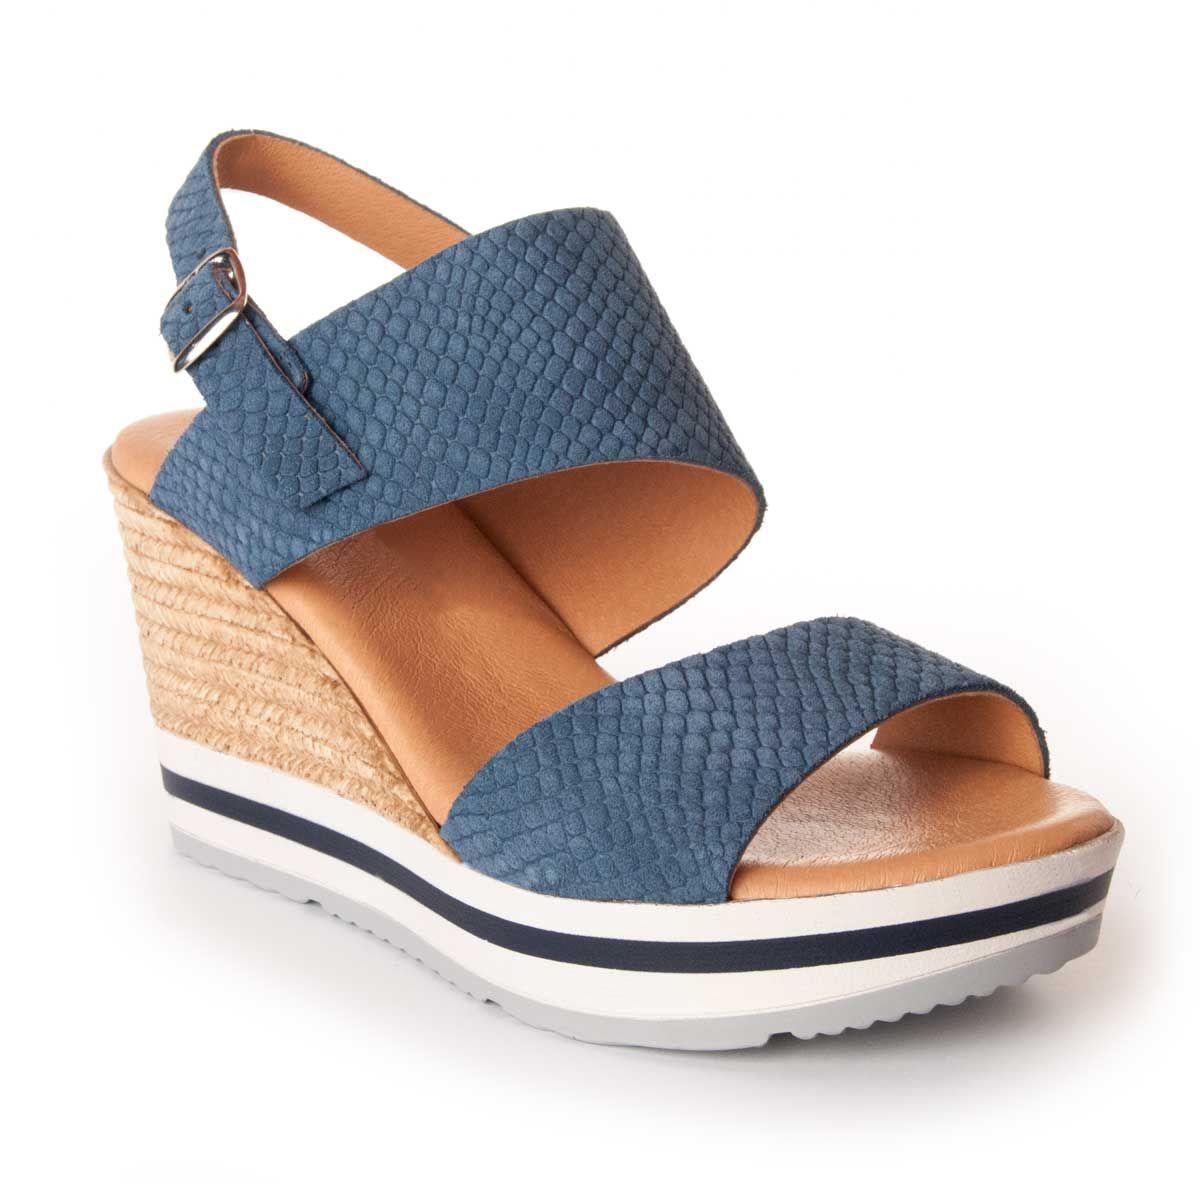 Montevita Chunky Heel Sandal in Blue